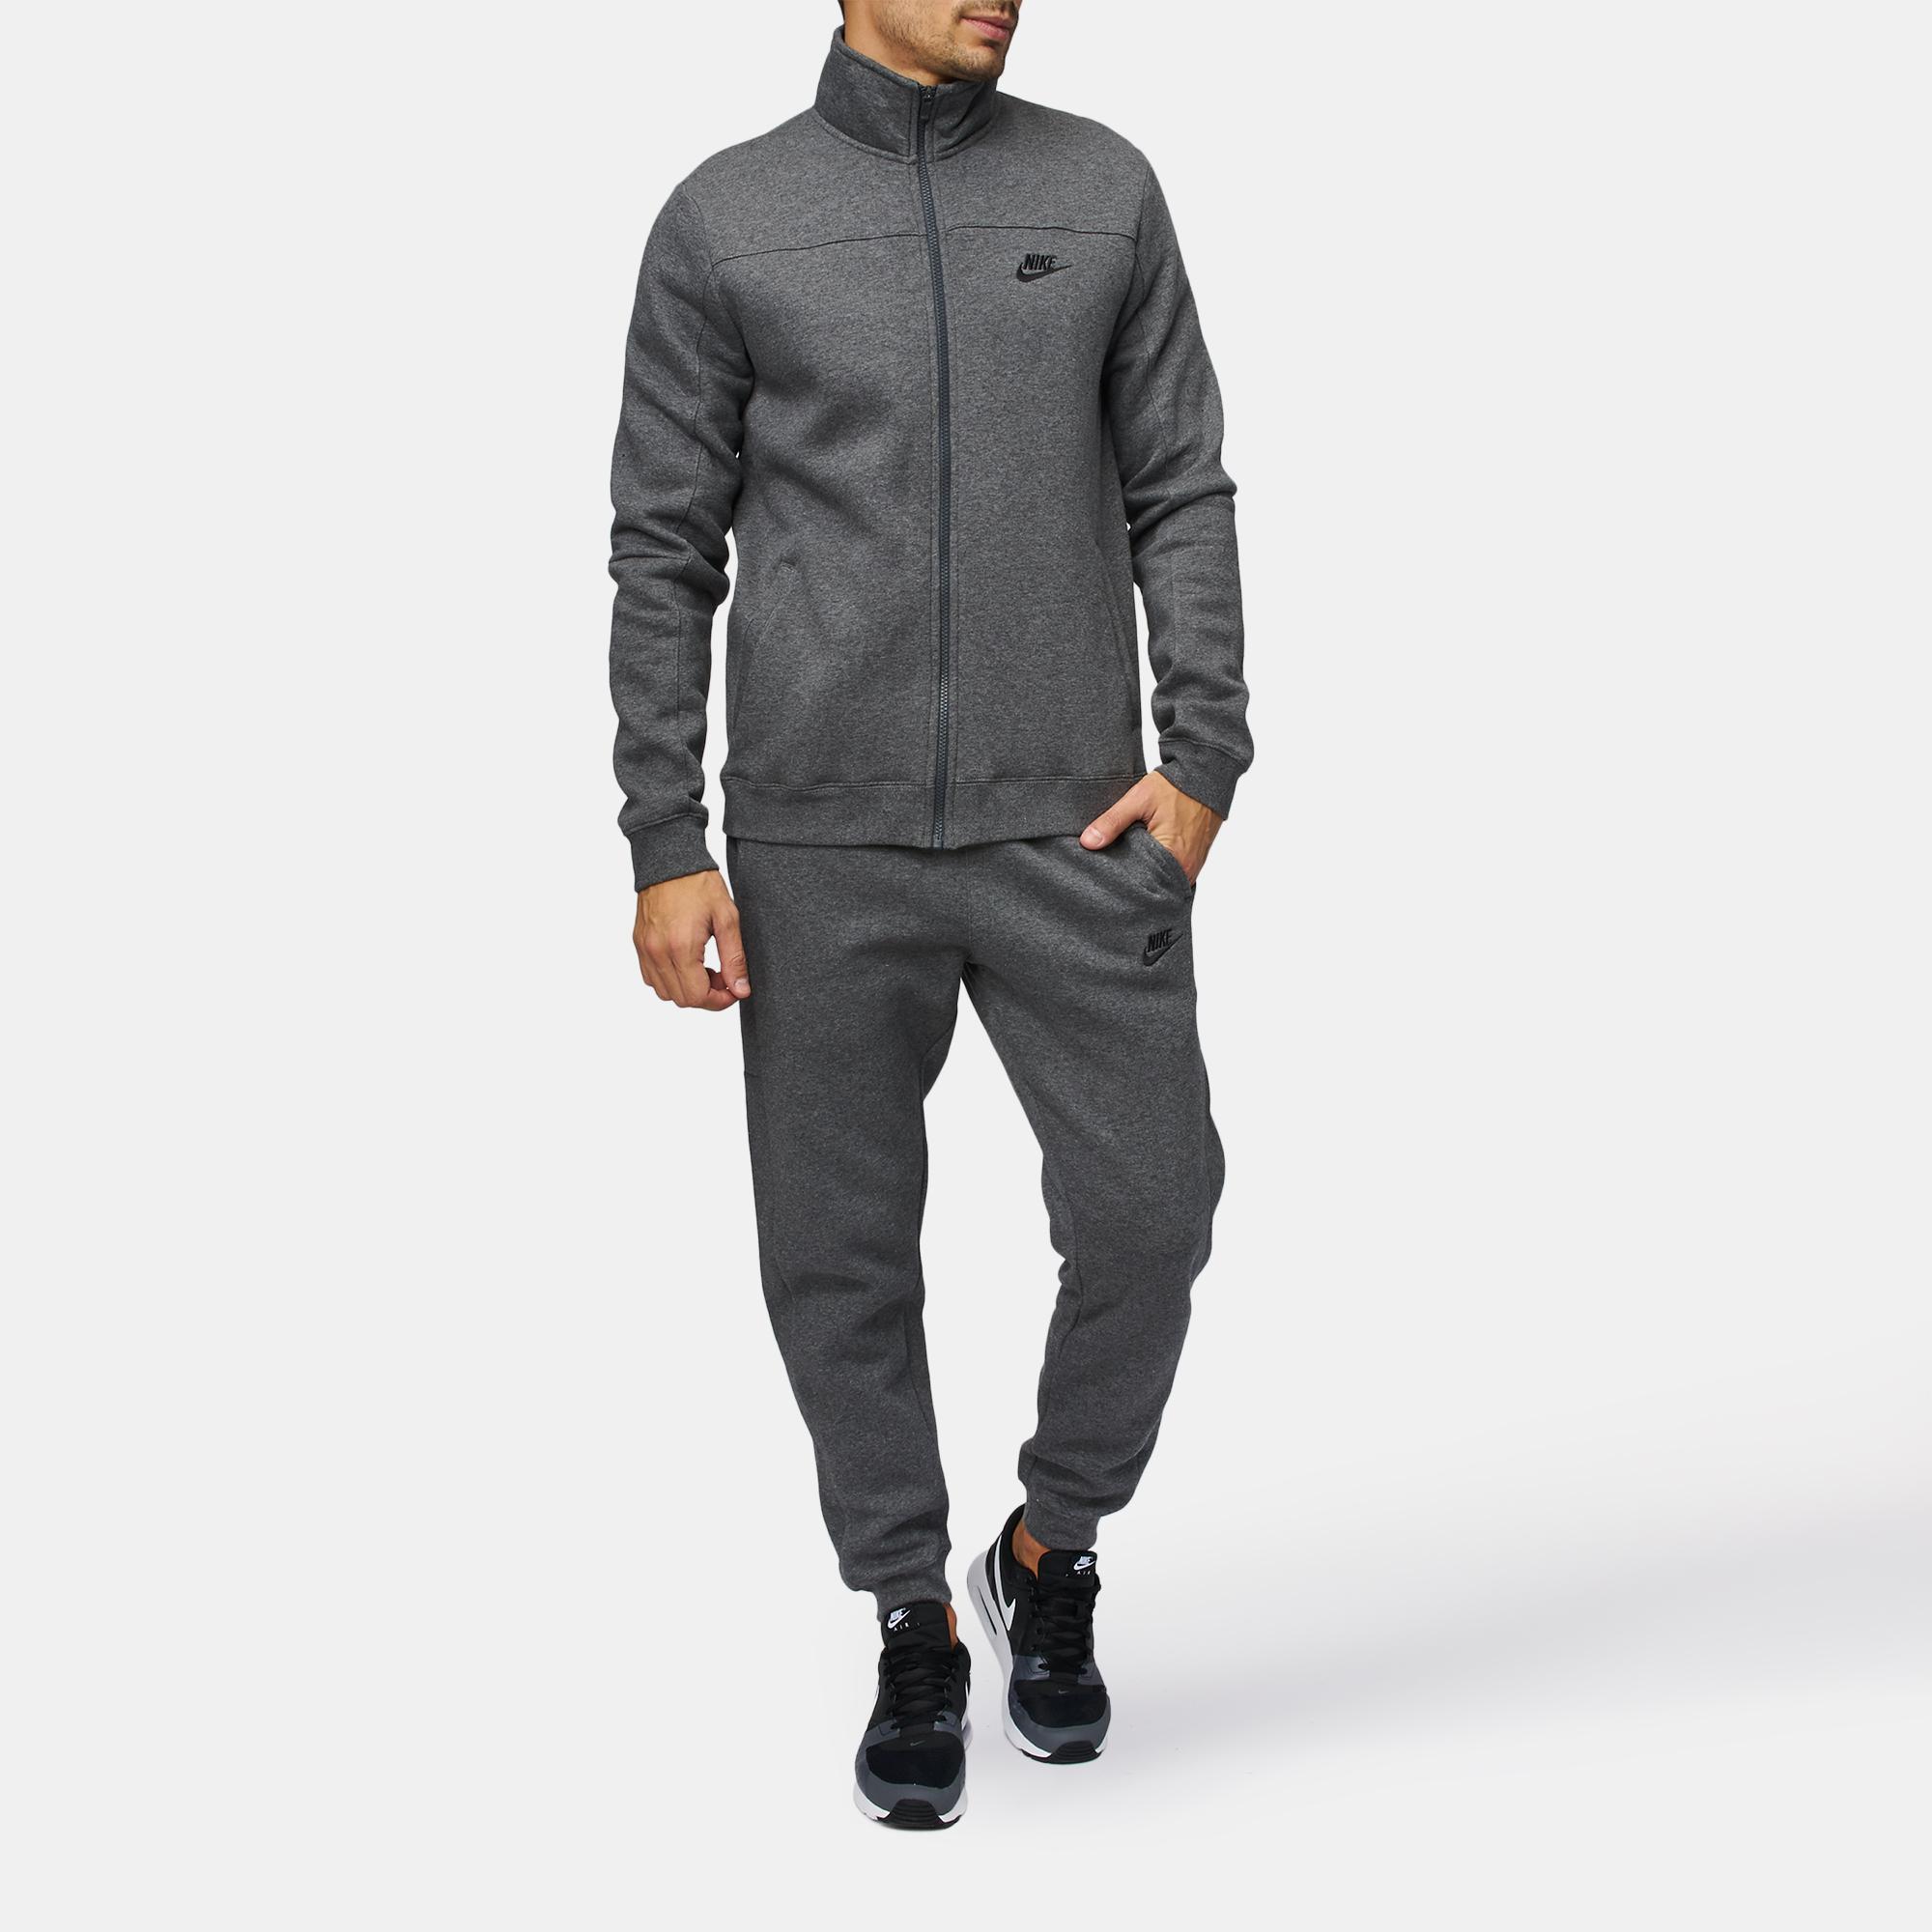 e128cd5aa73 Nike Sportswear Fleece Tracksuit | Tracksuits | Clothing | Men's Sale |  Sale | SSS